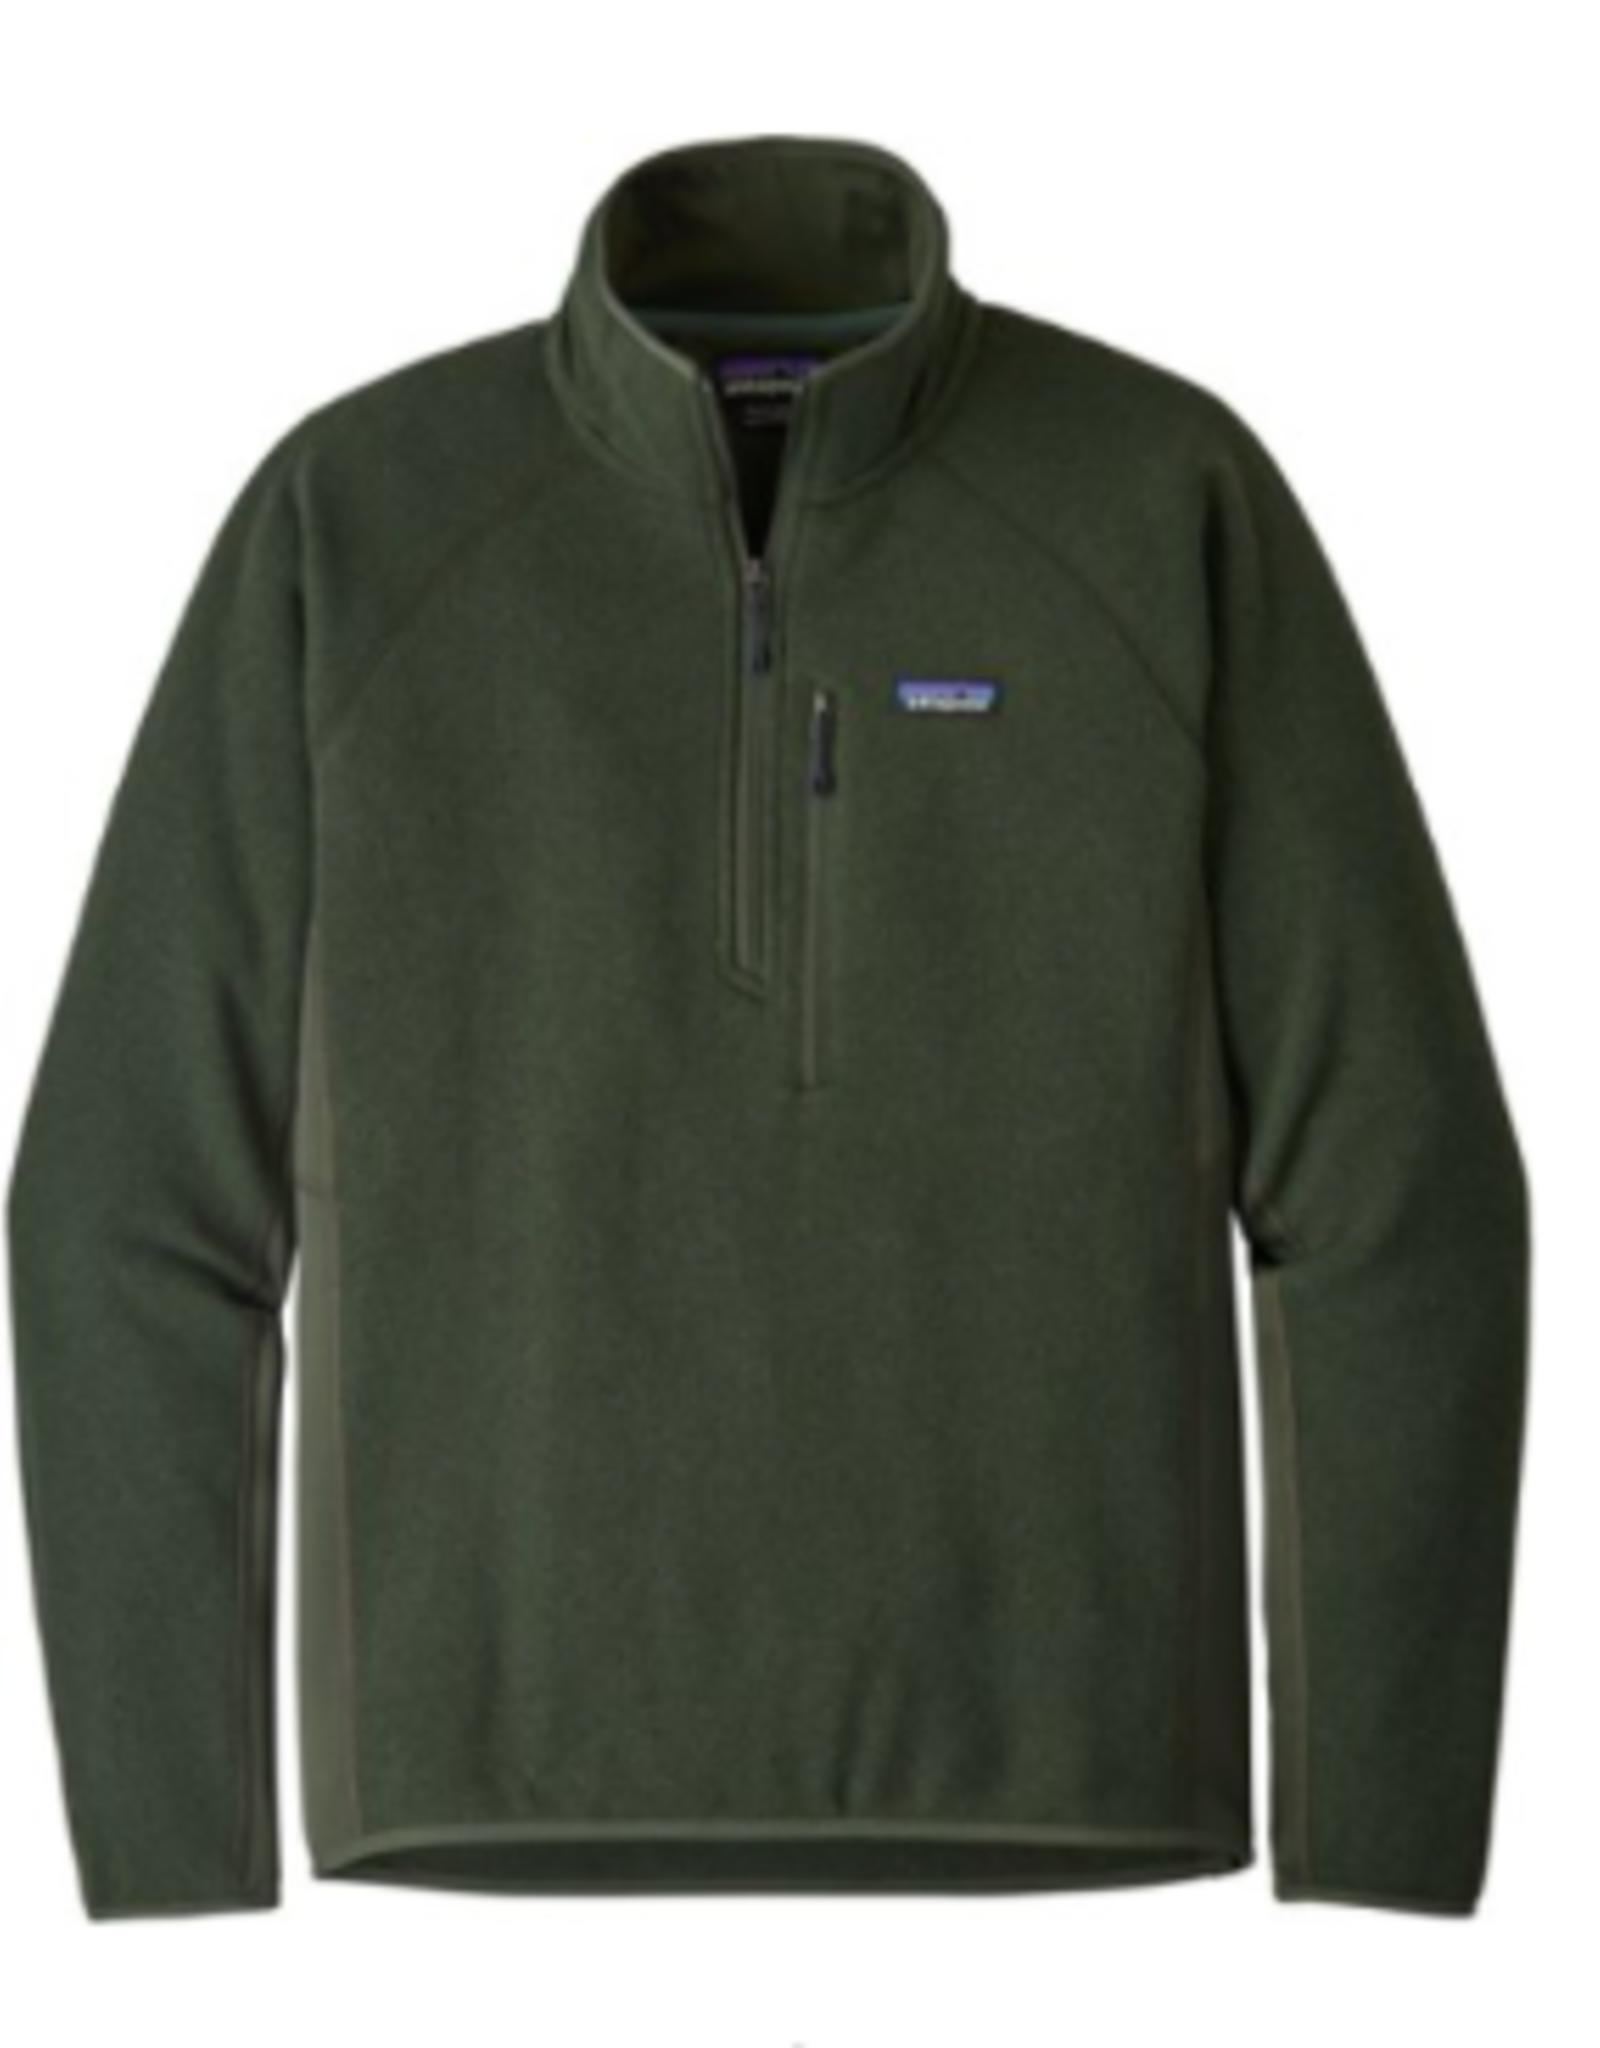 Patagonia M's Performance Better Sweater 1/4 Zip